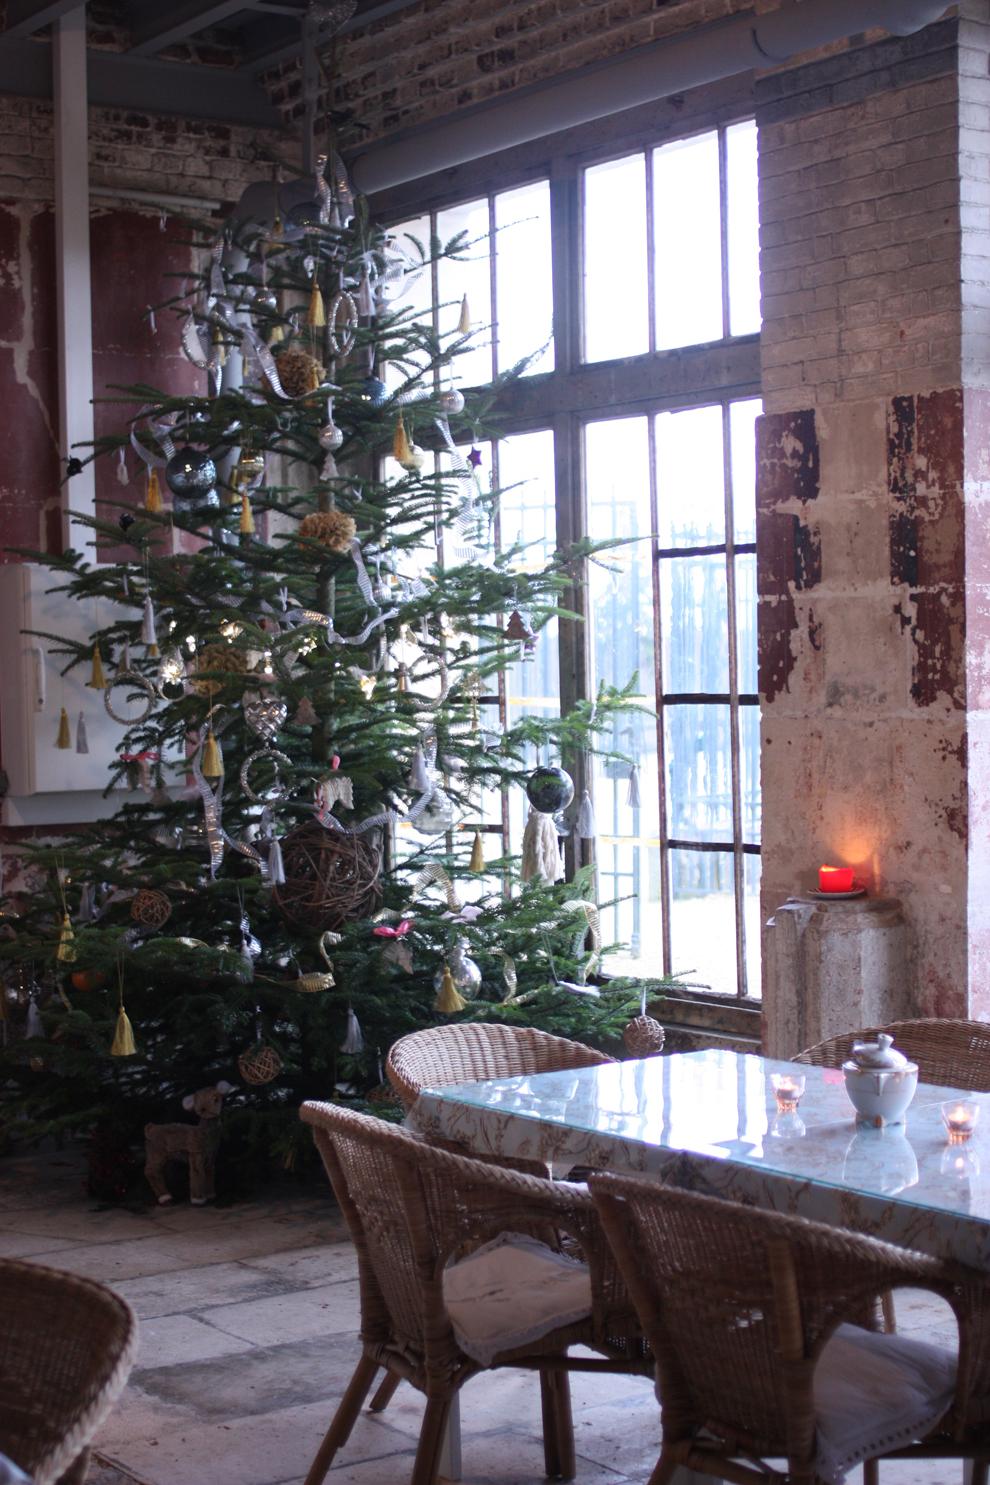 Orangerie_Compiegne_Christmas_tree